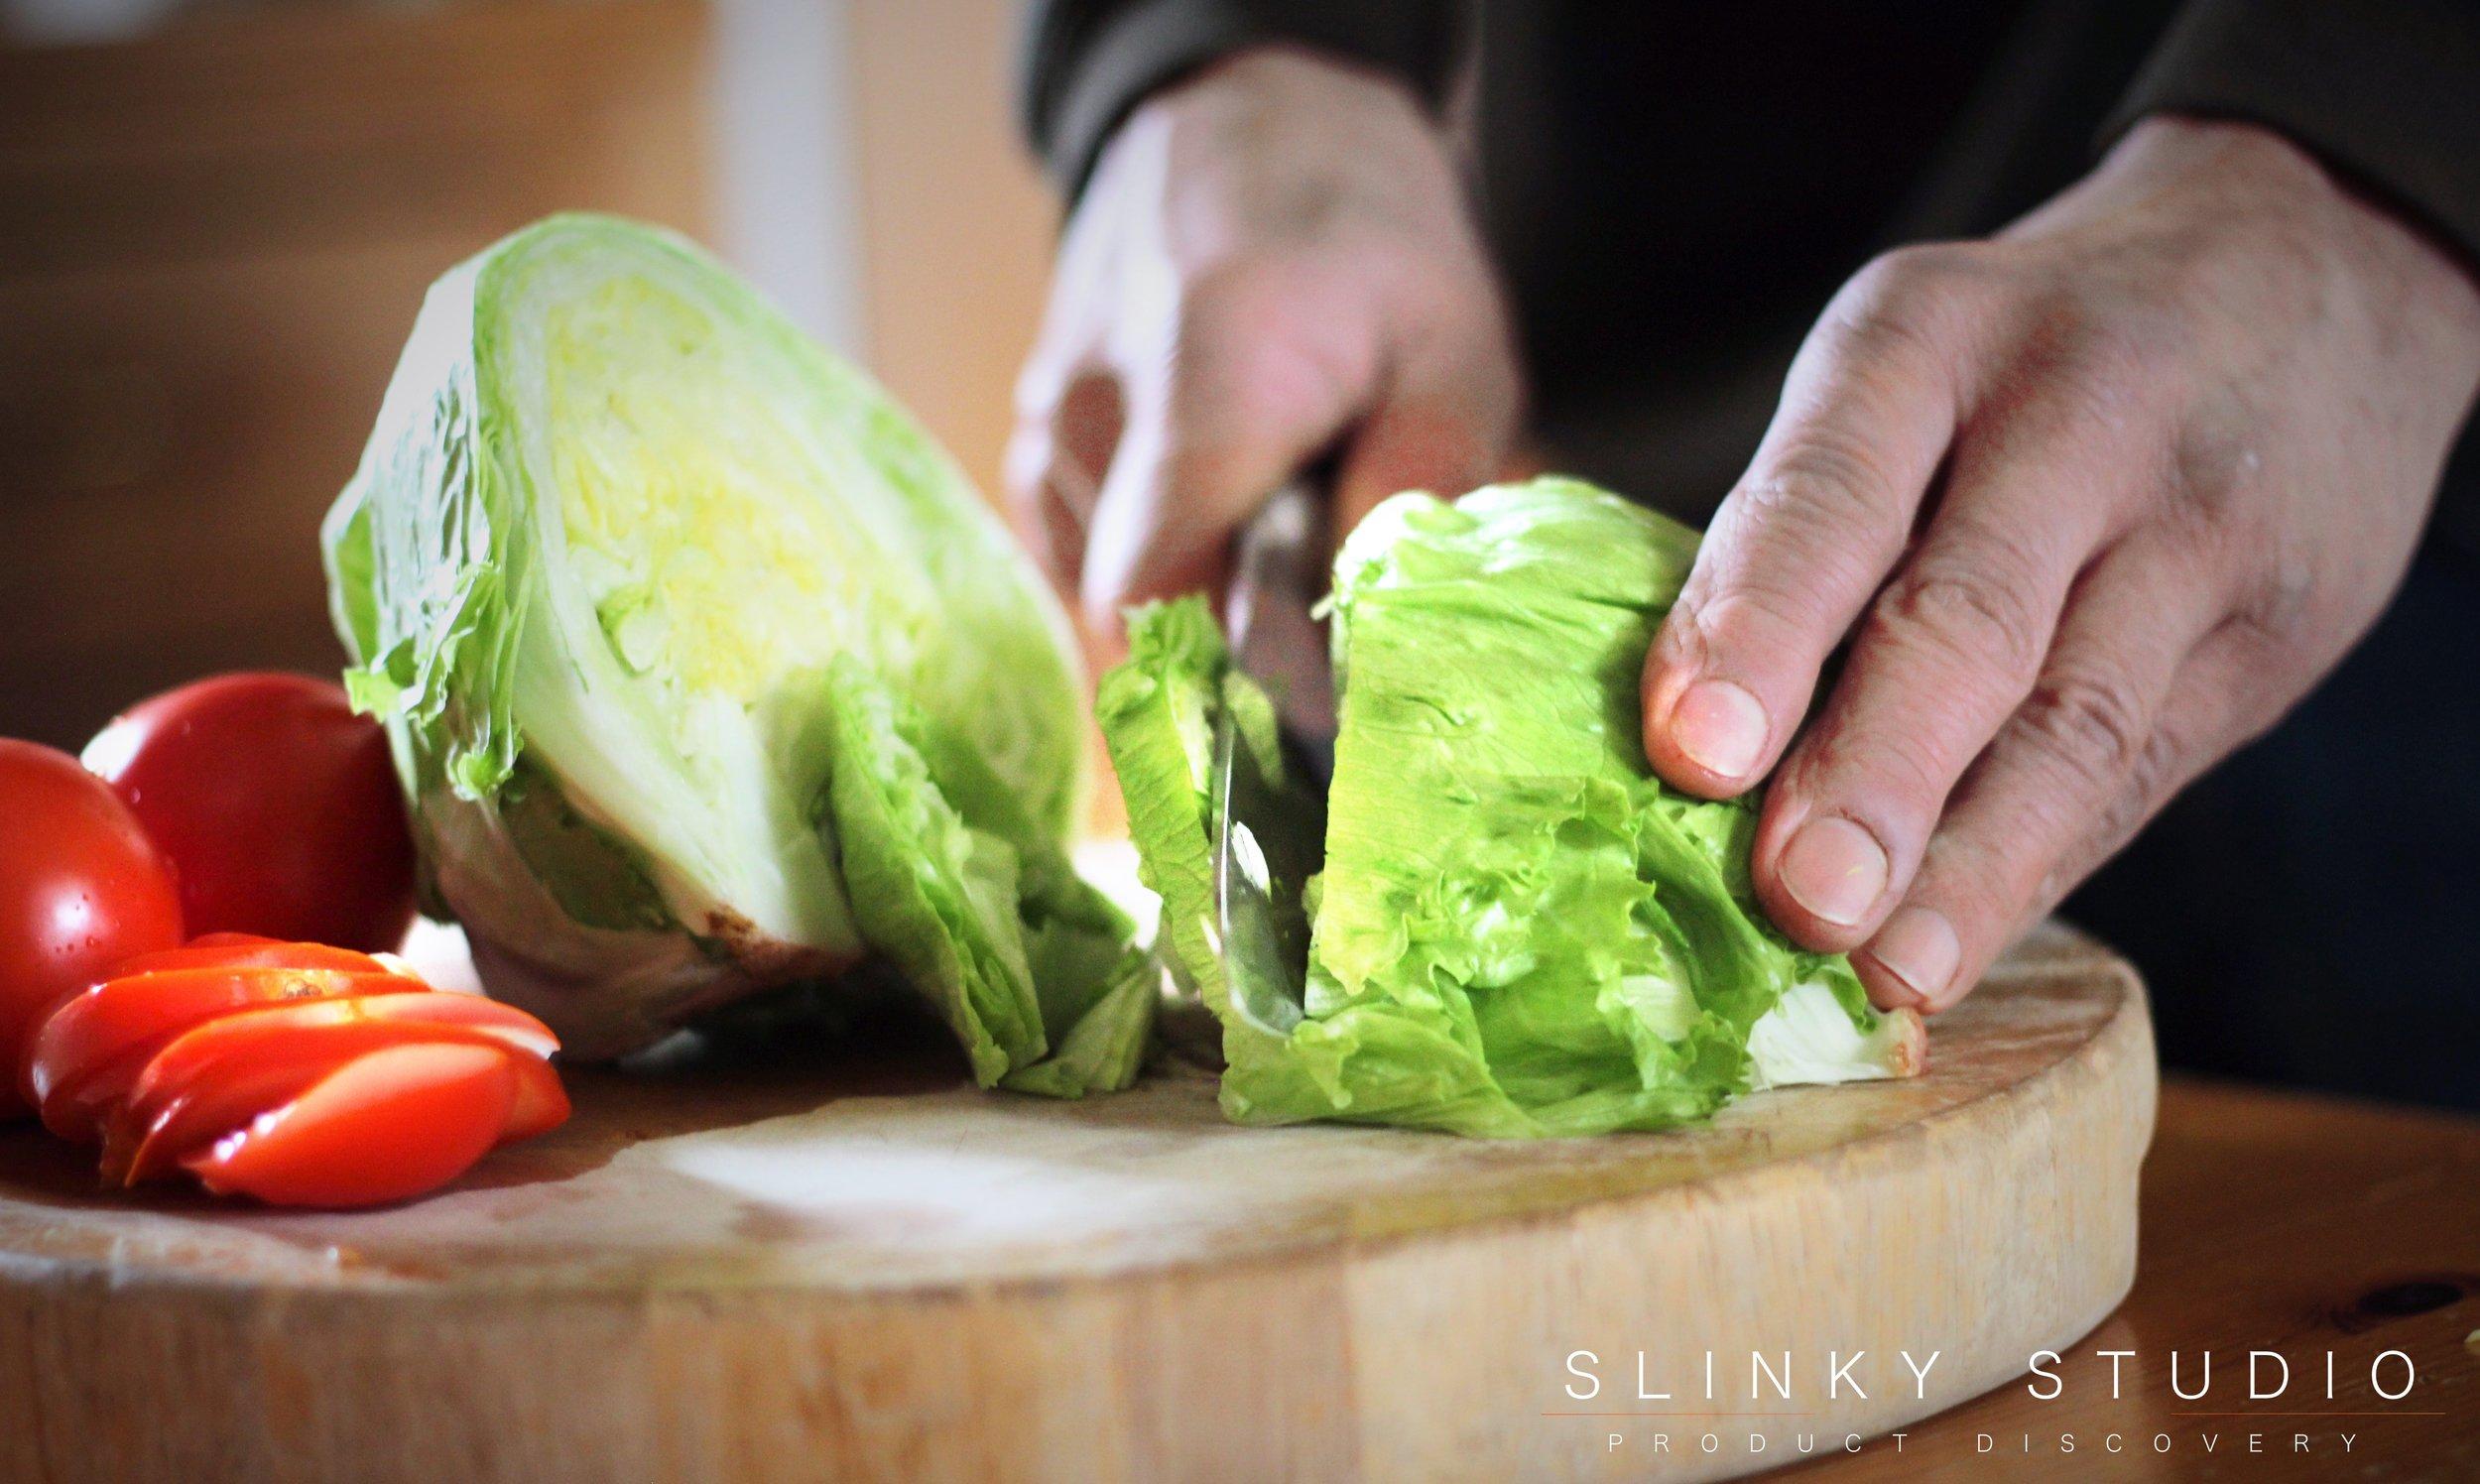 KitchenAid 7pc Professional Series Cutlery Set 8%22Chef Knife Cutting Lettuce.jpg